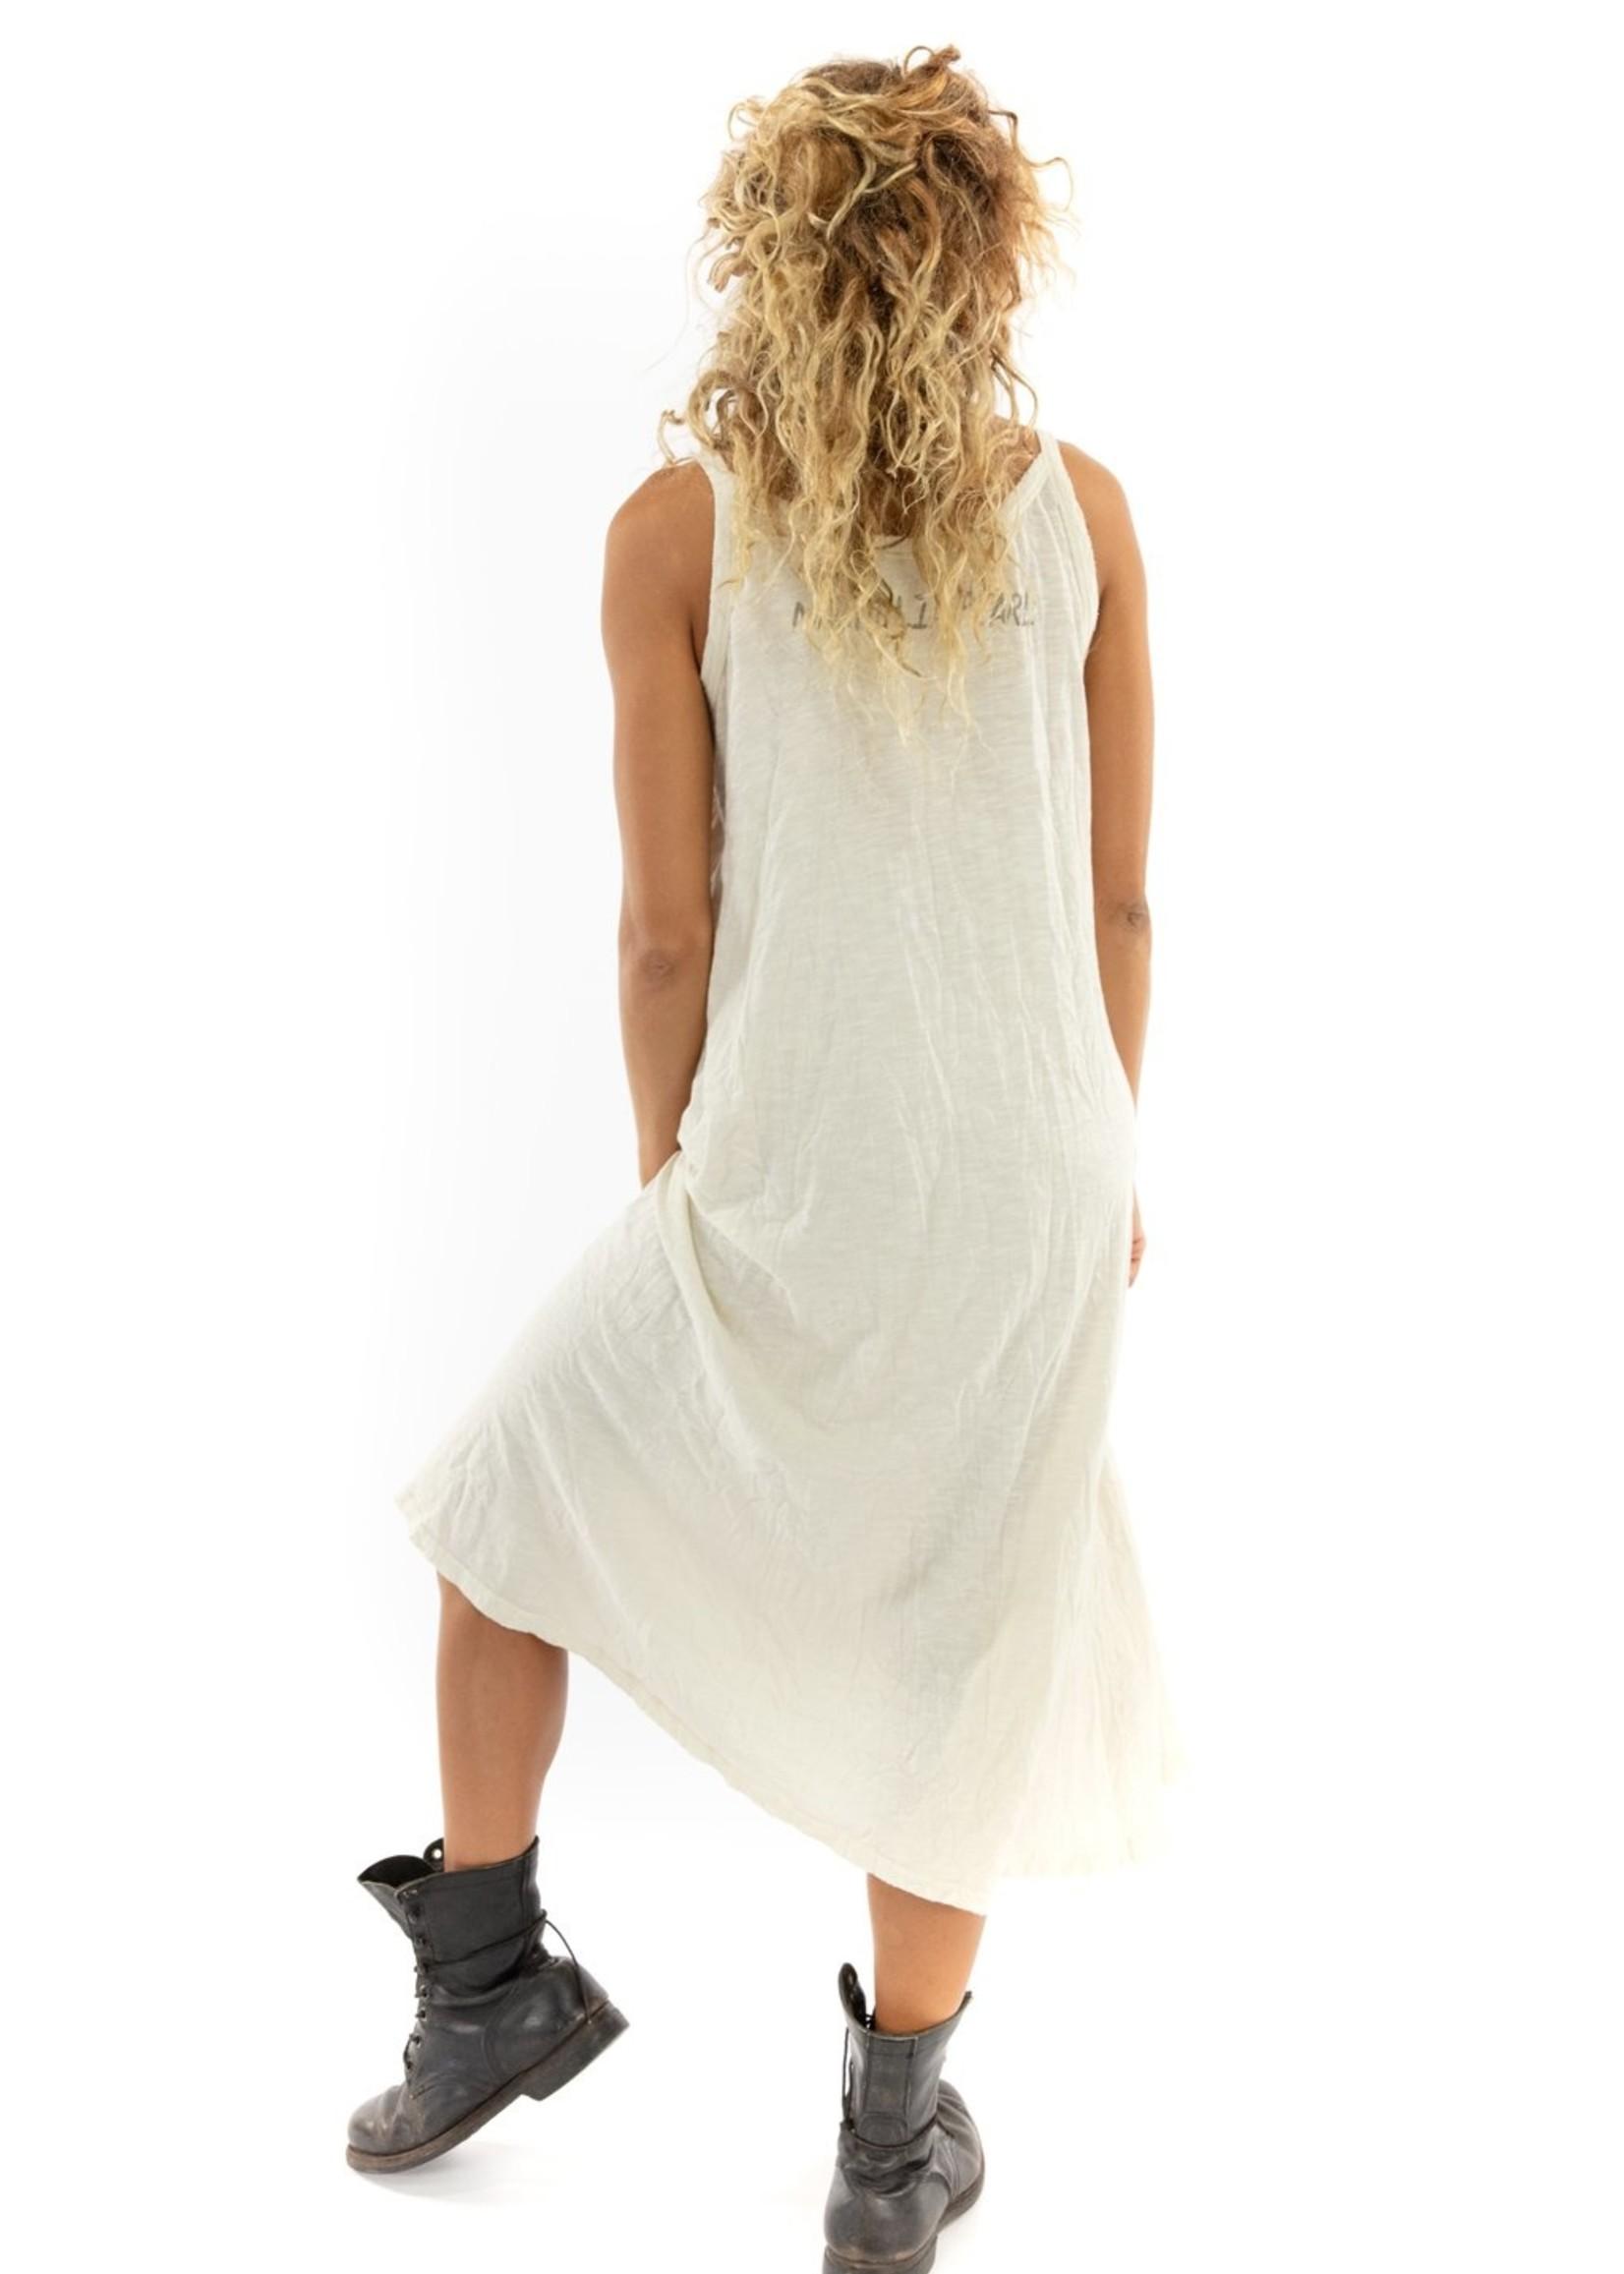 Magnolia Pearl Lana Tank Dress - Moonlight